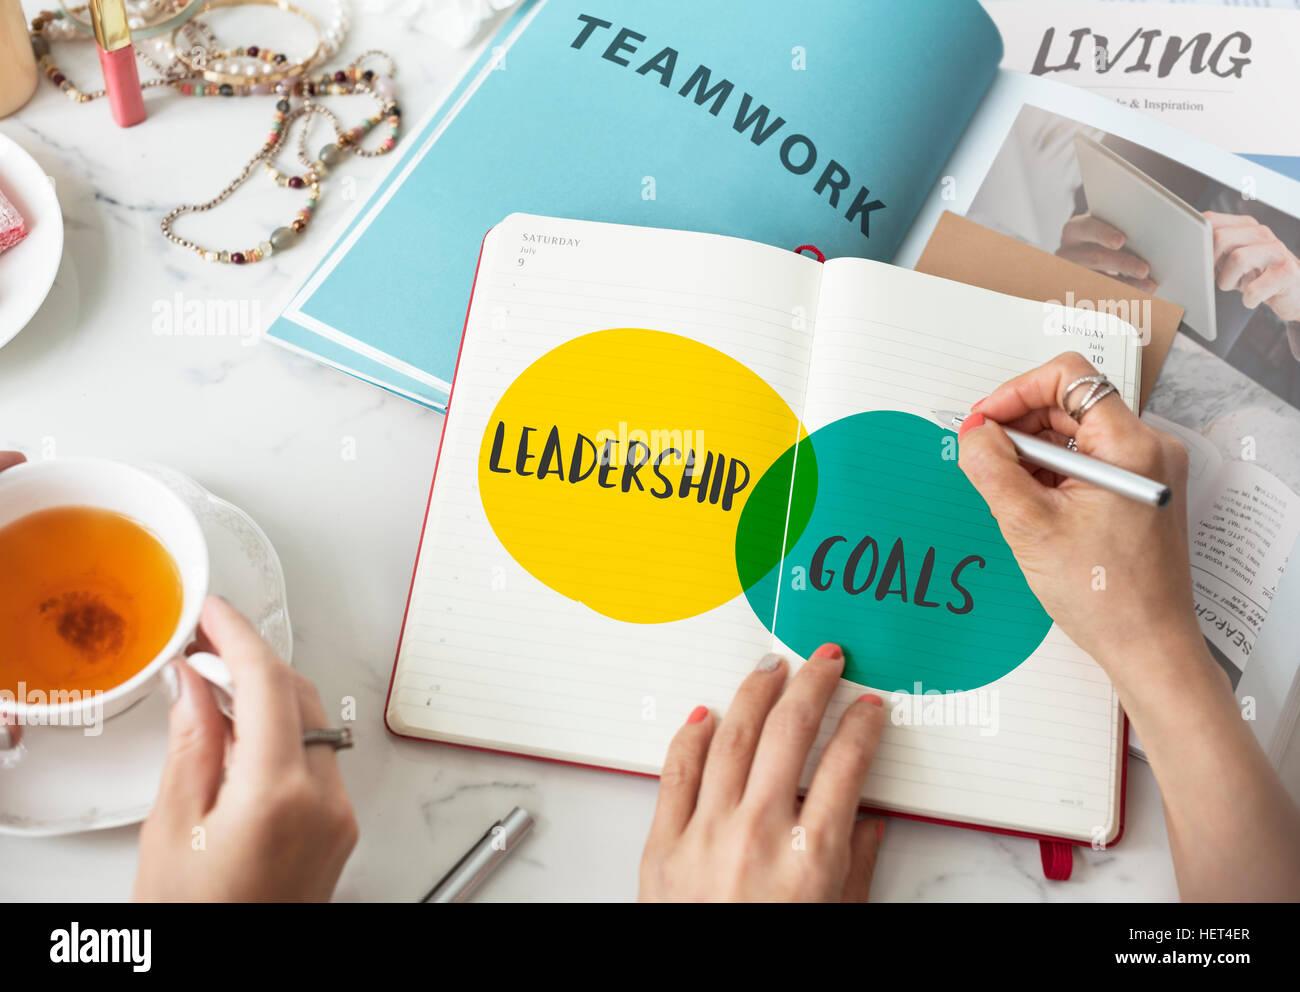 Führung Ziele Ideen Motivation Kreise Konzept Stockbild